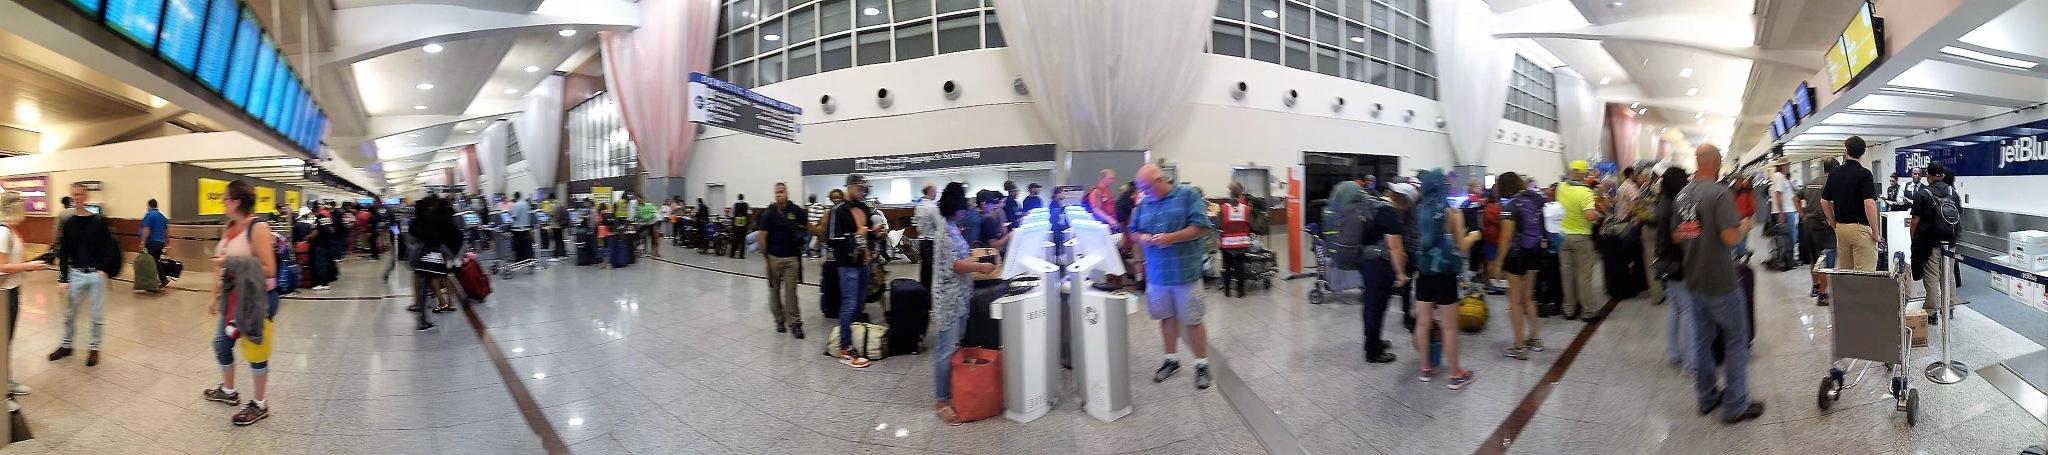 San Juan Airport by Laurie Puglia